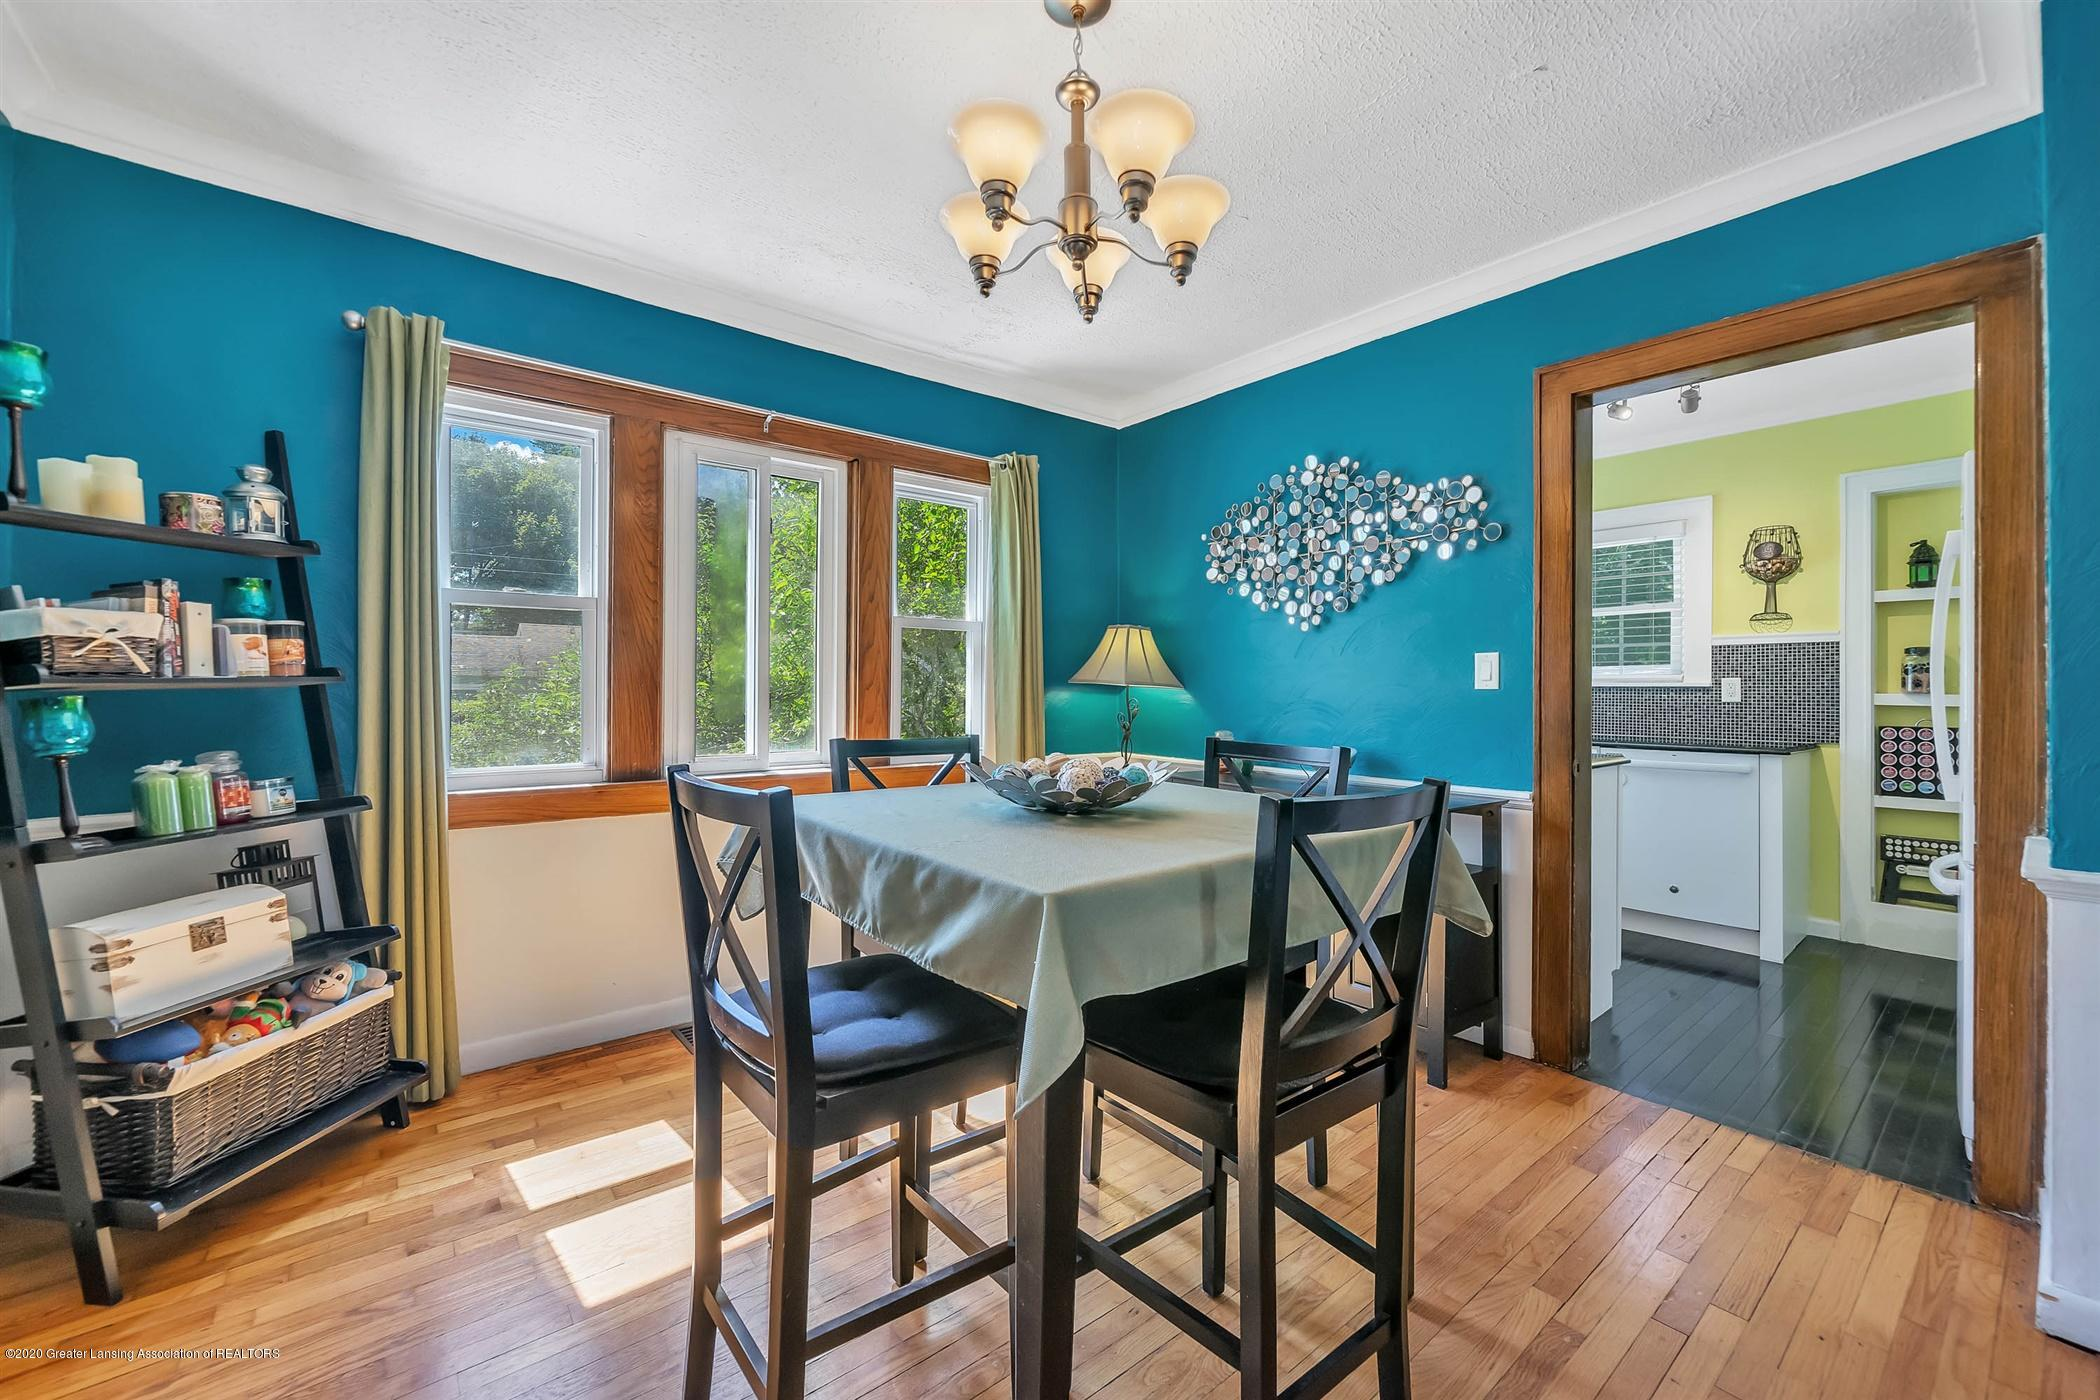 2032 Clifton Ave - (5) MAIN FLOOR Dining Room - 6